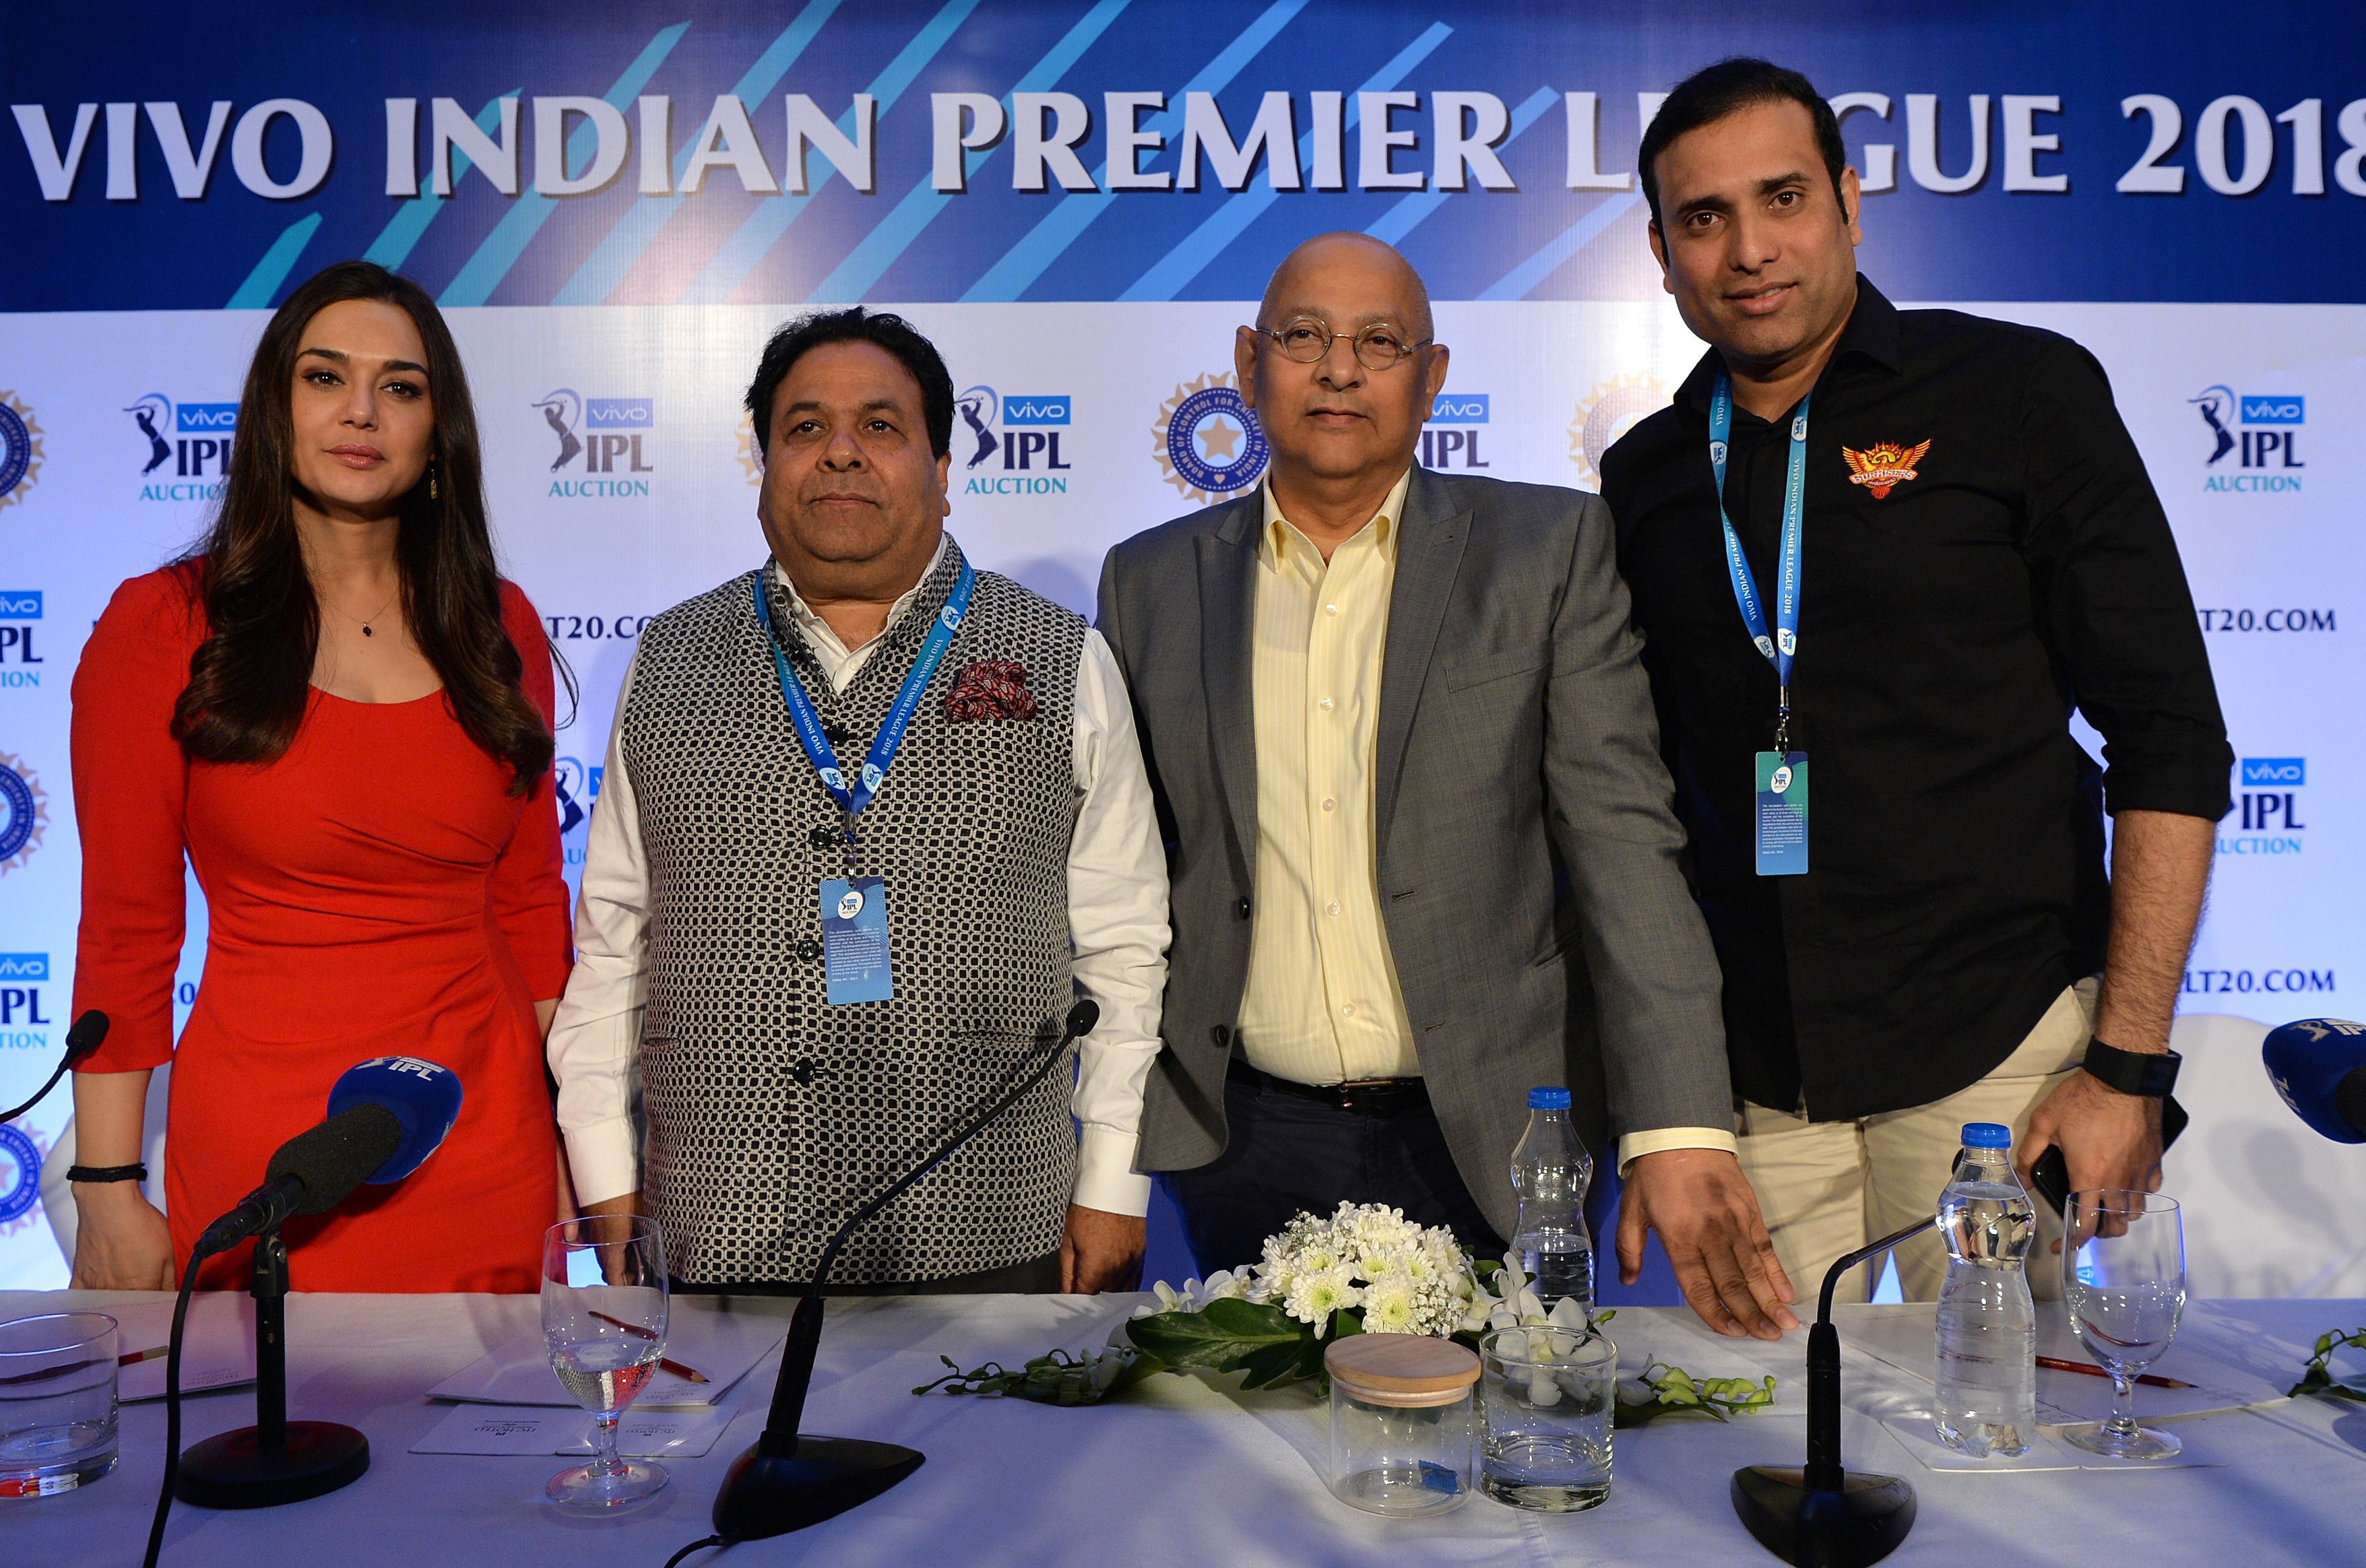 INDIA-CRICKET-T20-IPL-AUCTION